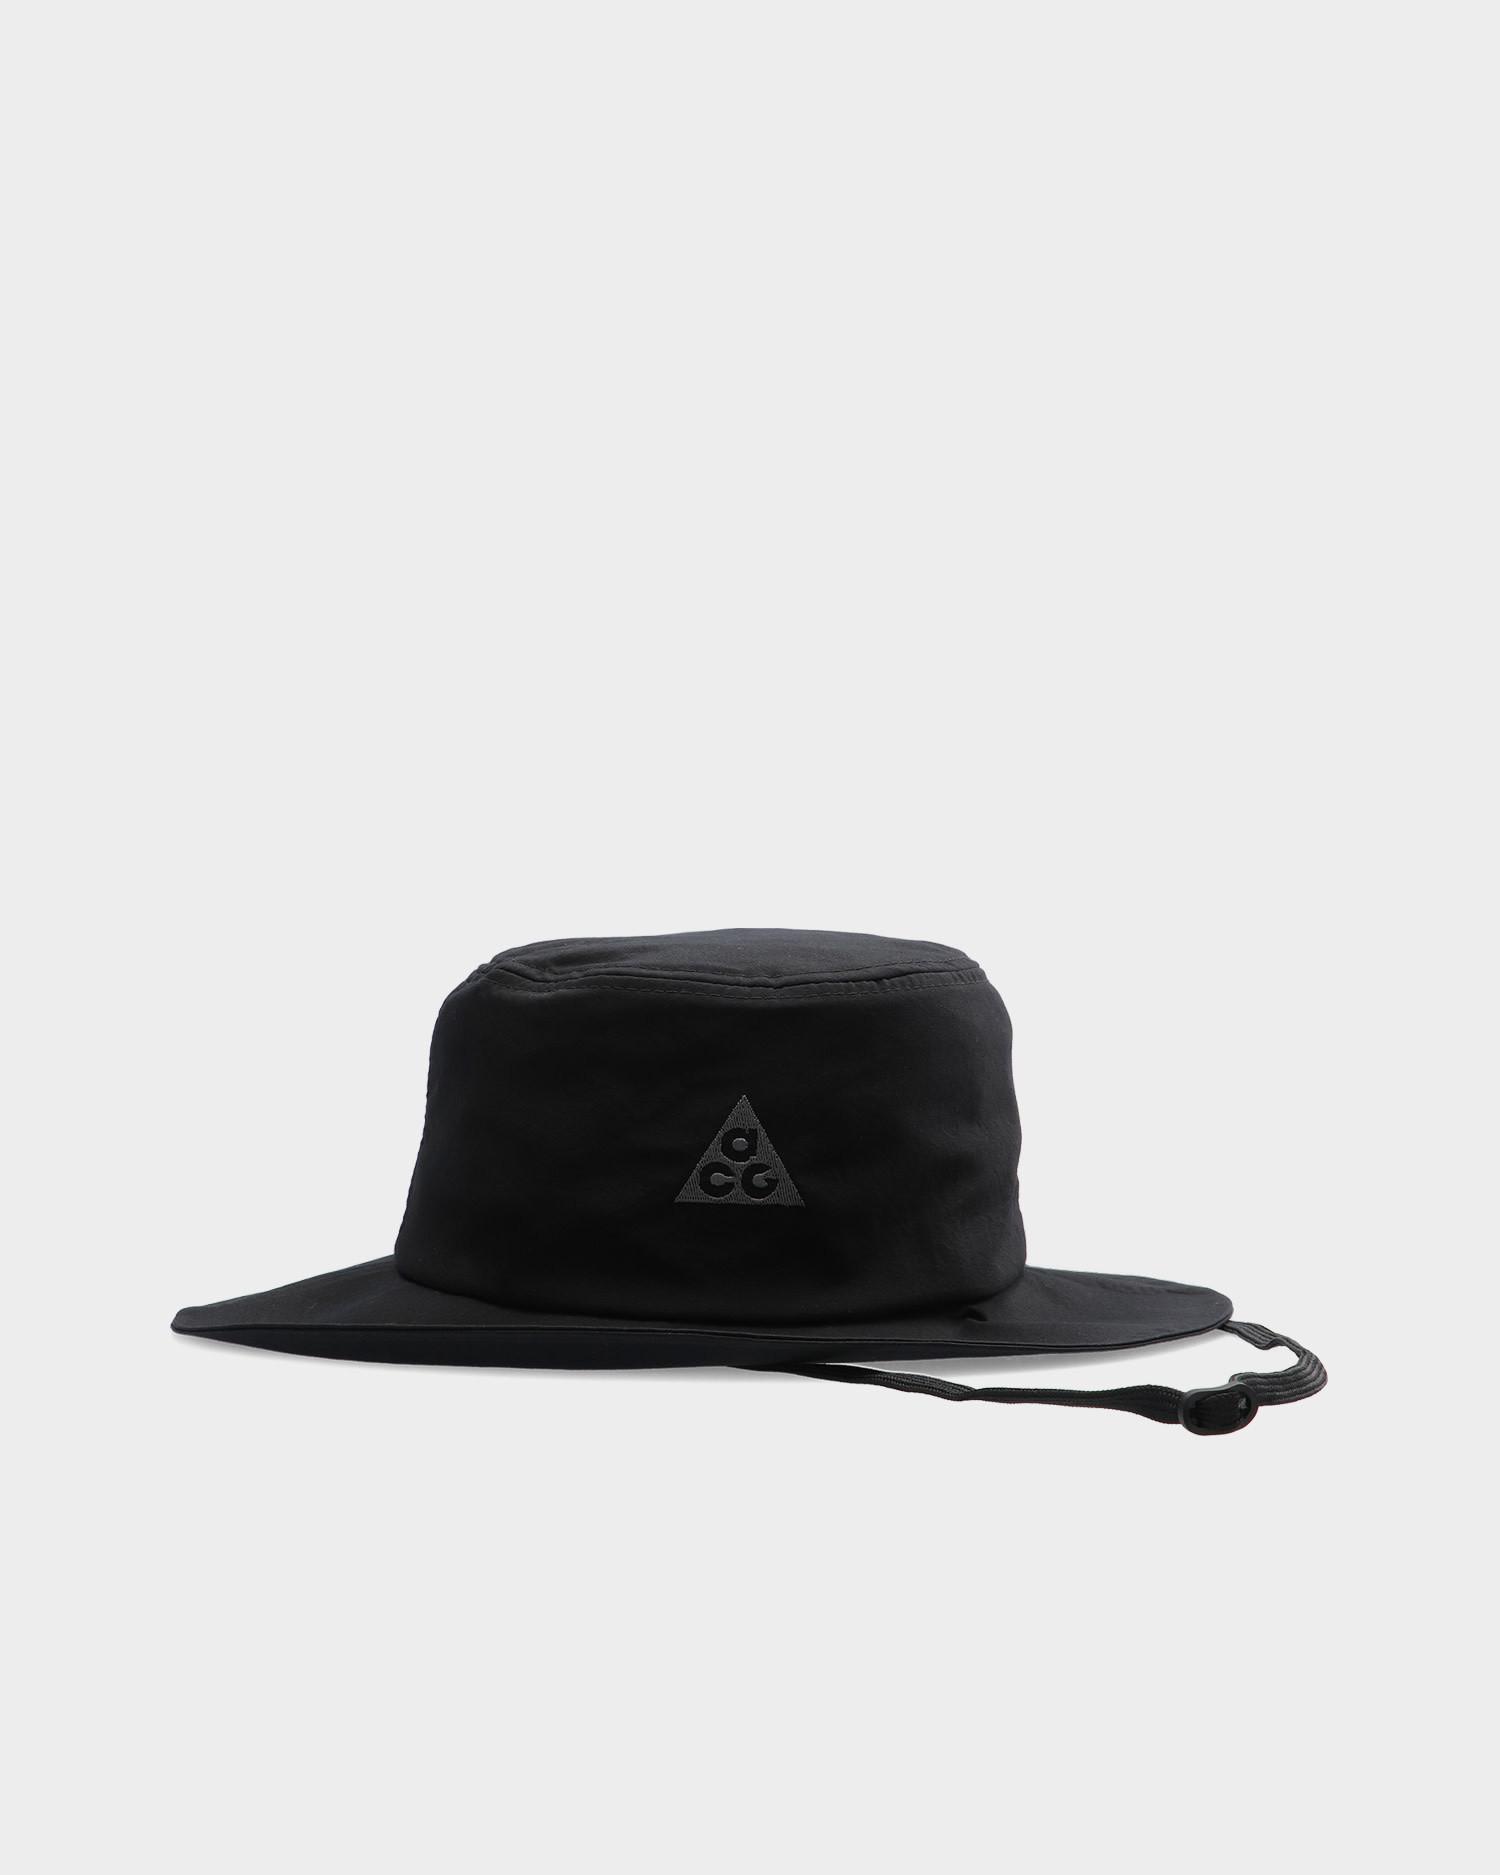 Nike U NRG ACG Bucket Hat Black